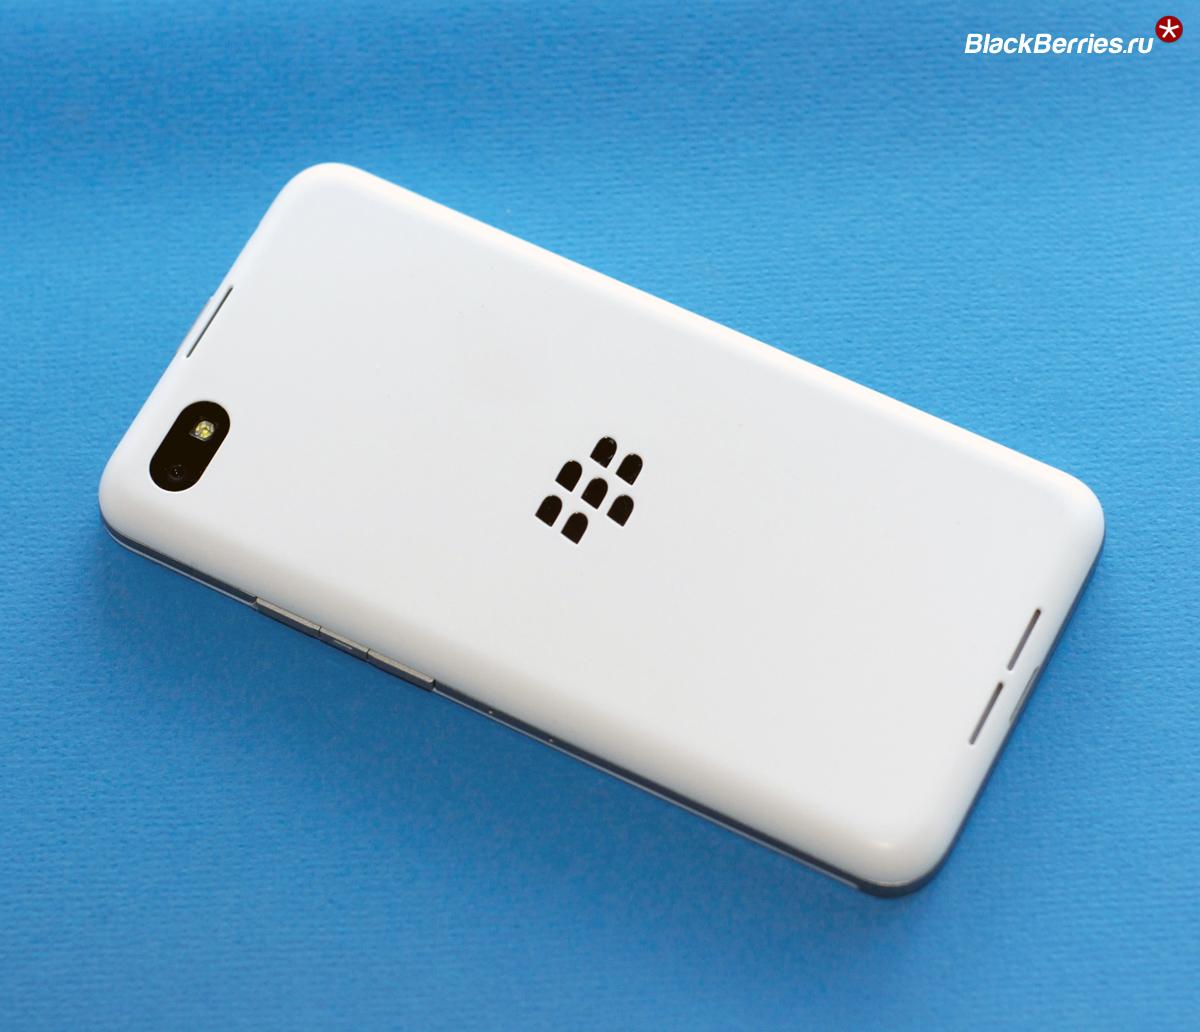 BlackBerry-Z30-White-1